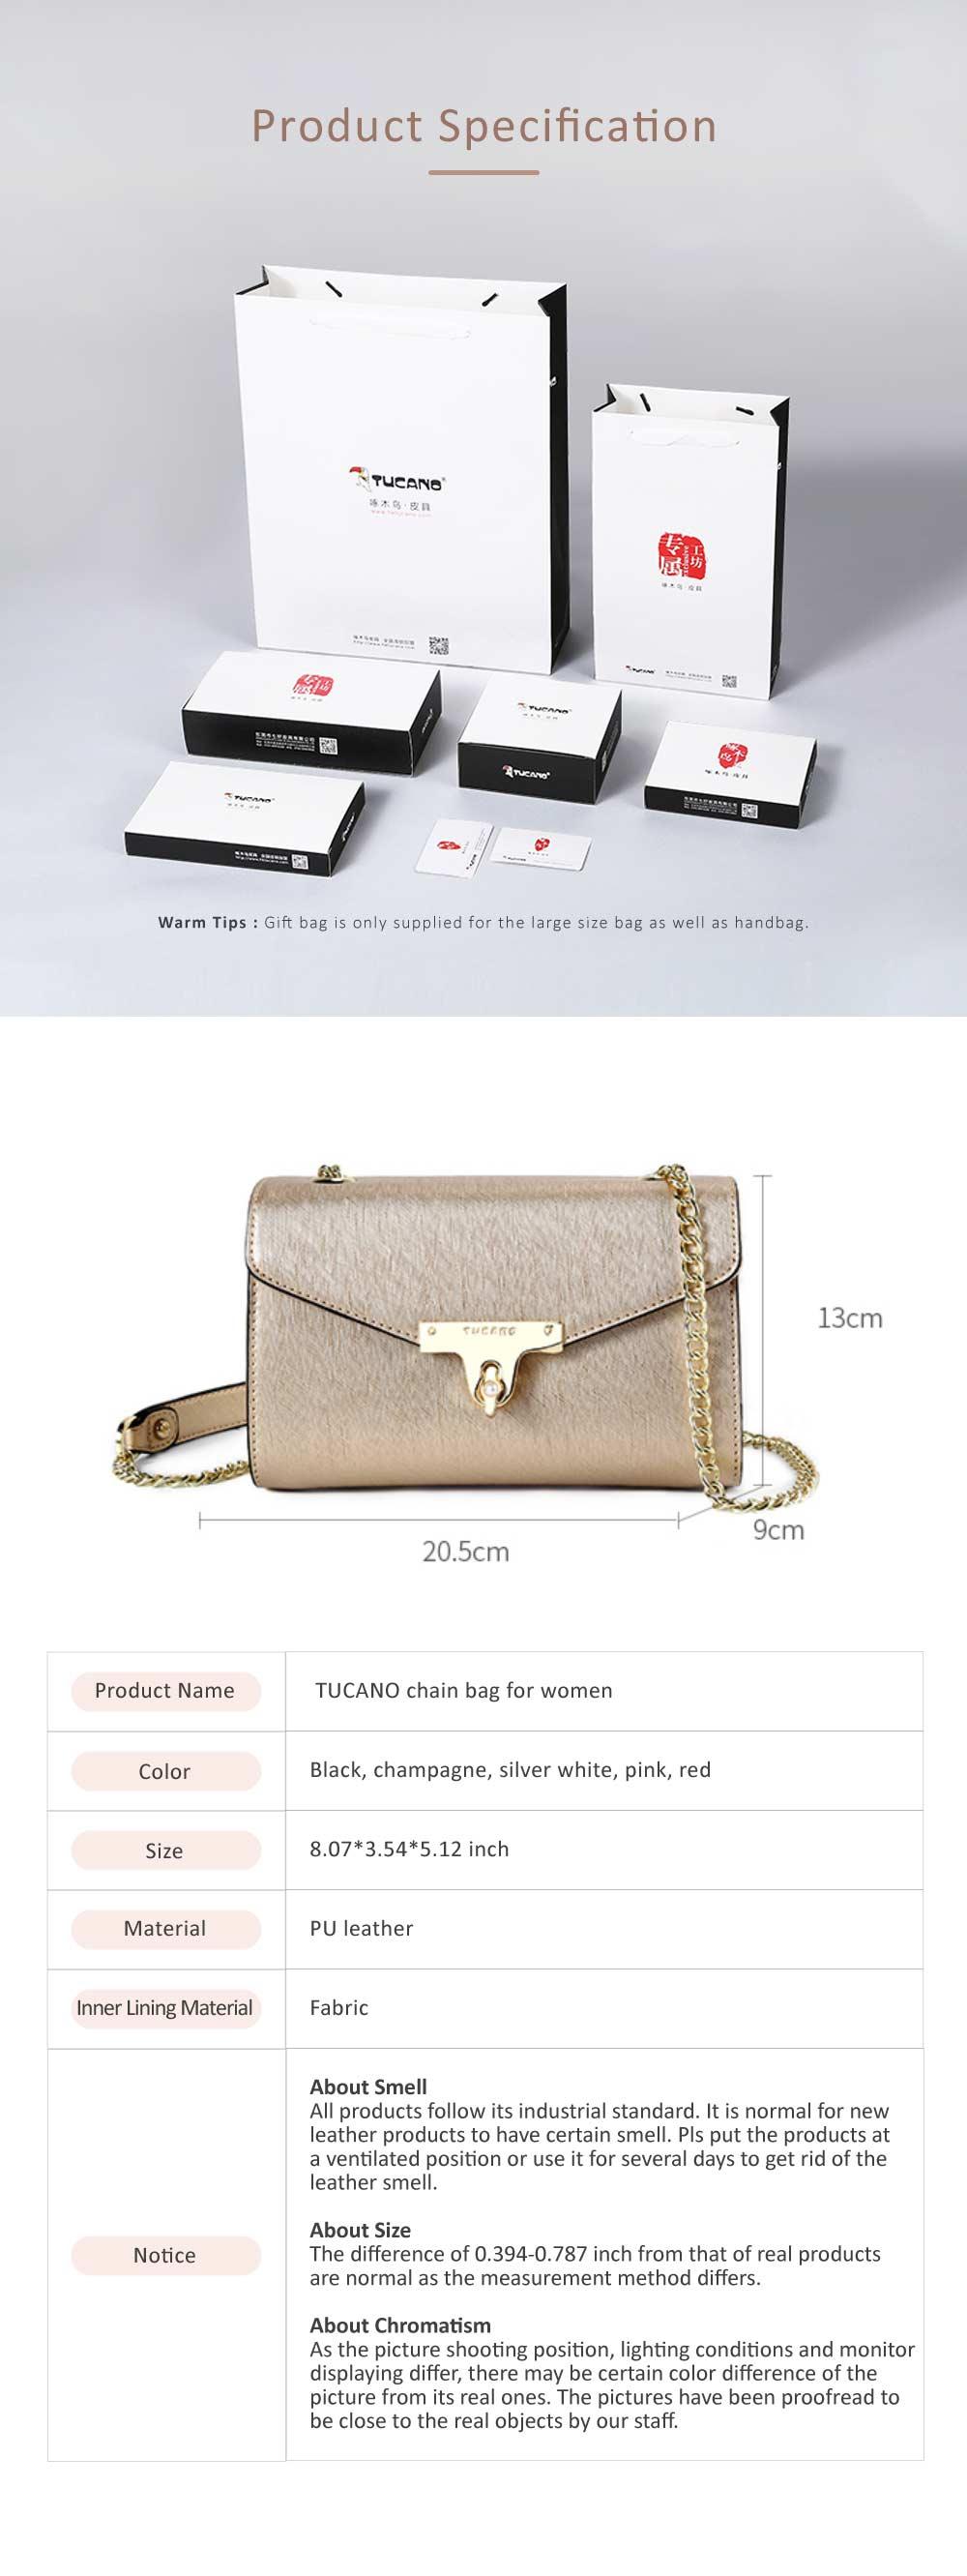 TUCANO Chain Bag for Women, Fashionable Square Messenger Bag for Women Spring Summer, Single-shoulder Bag 9